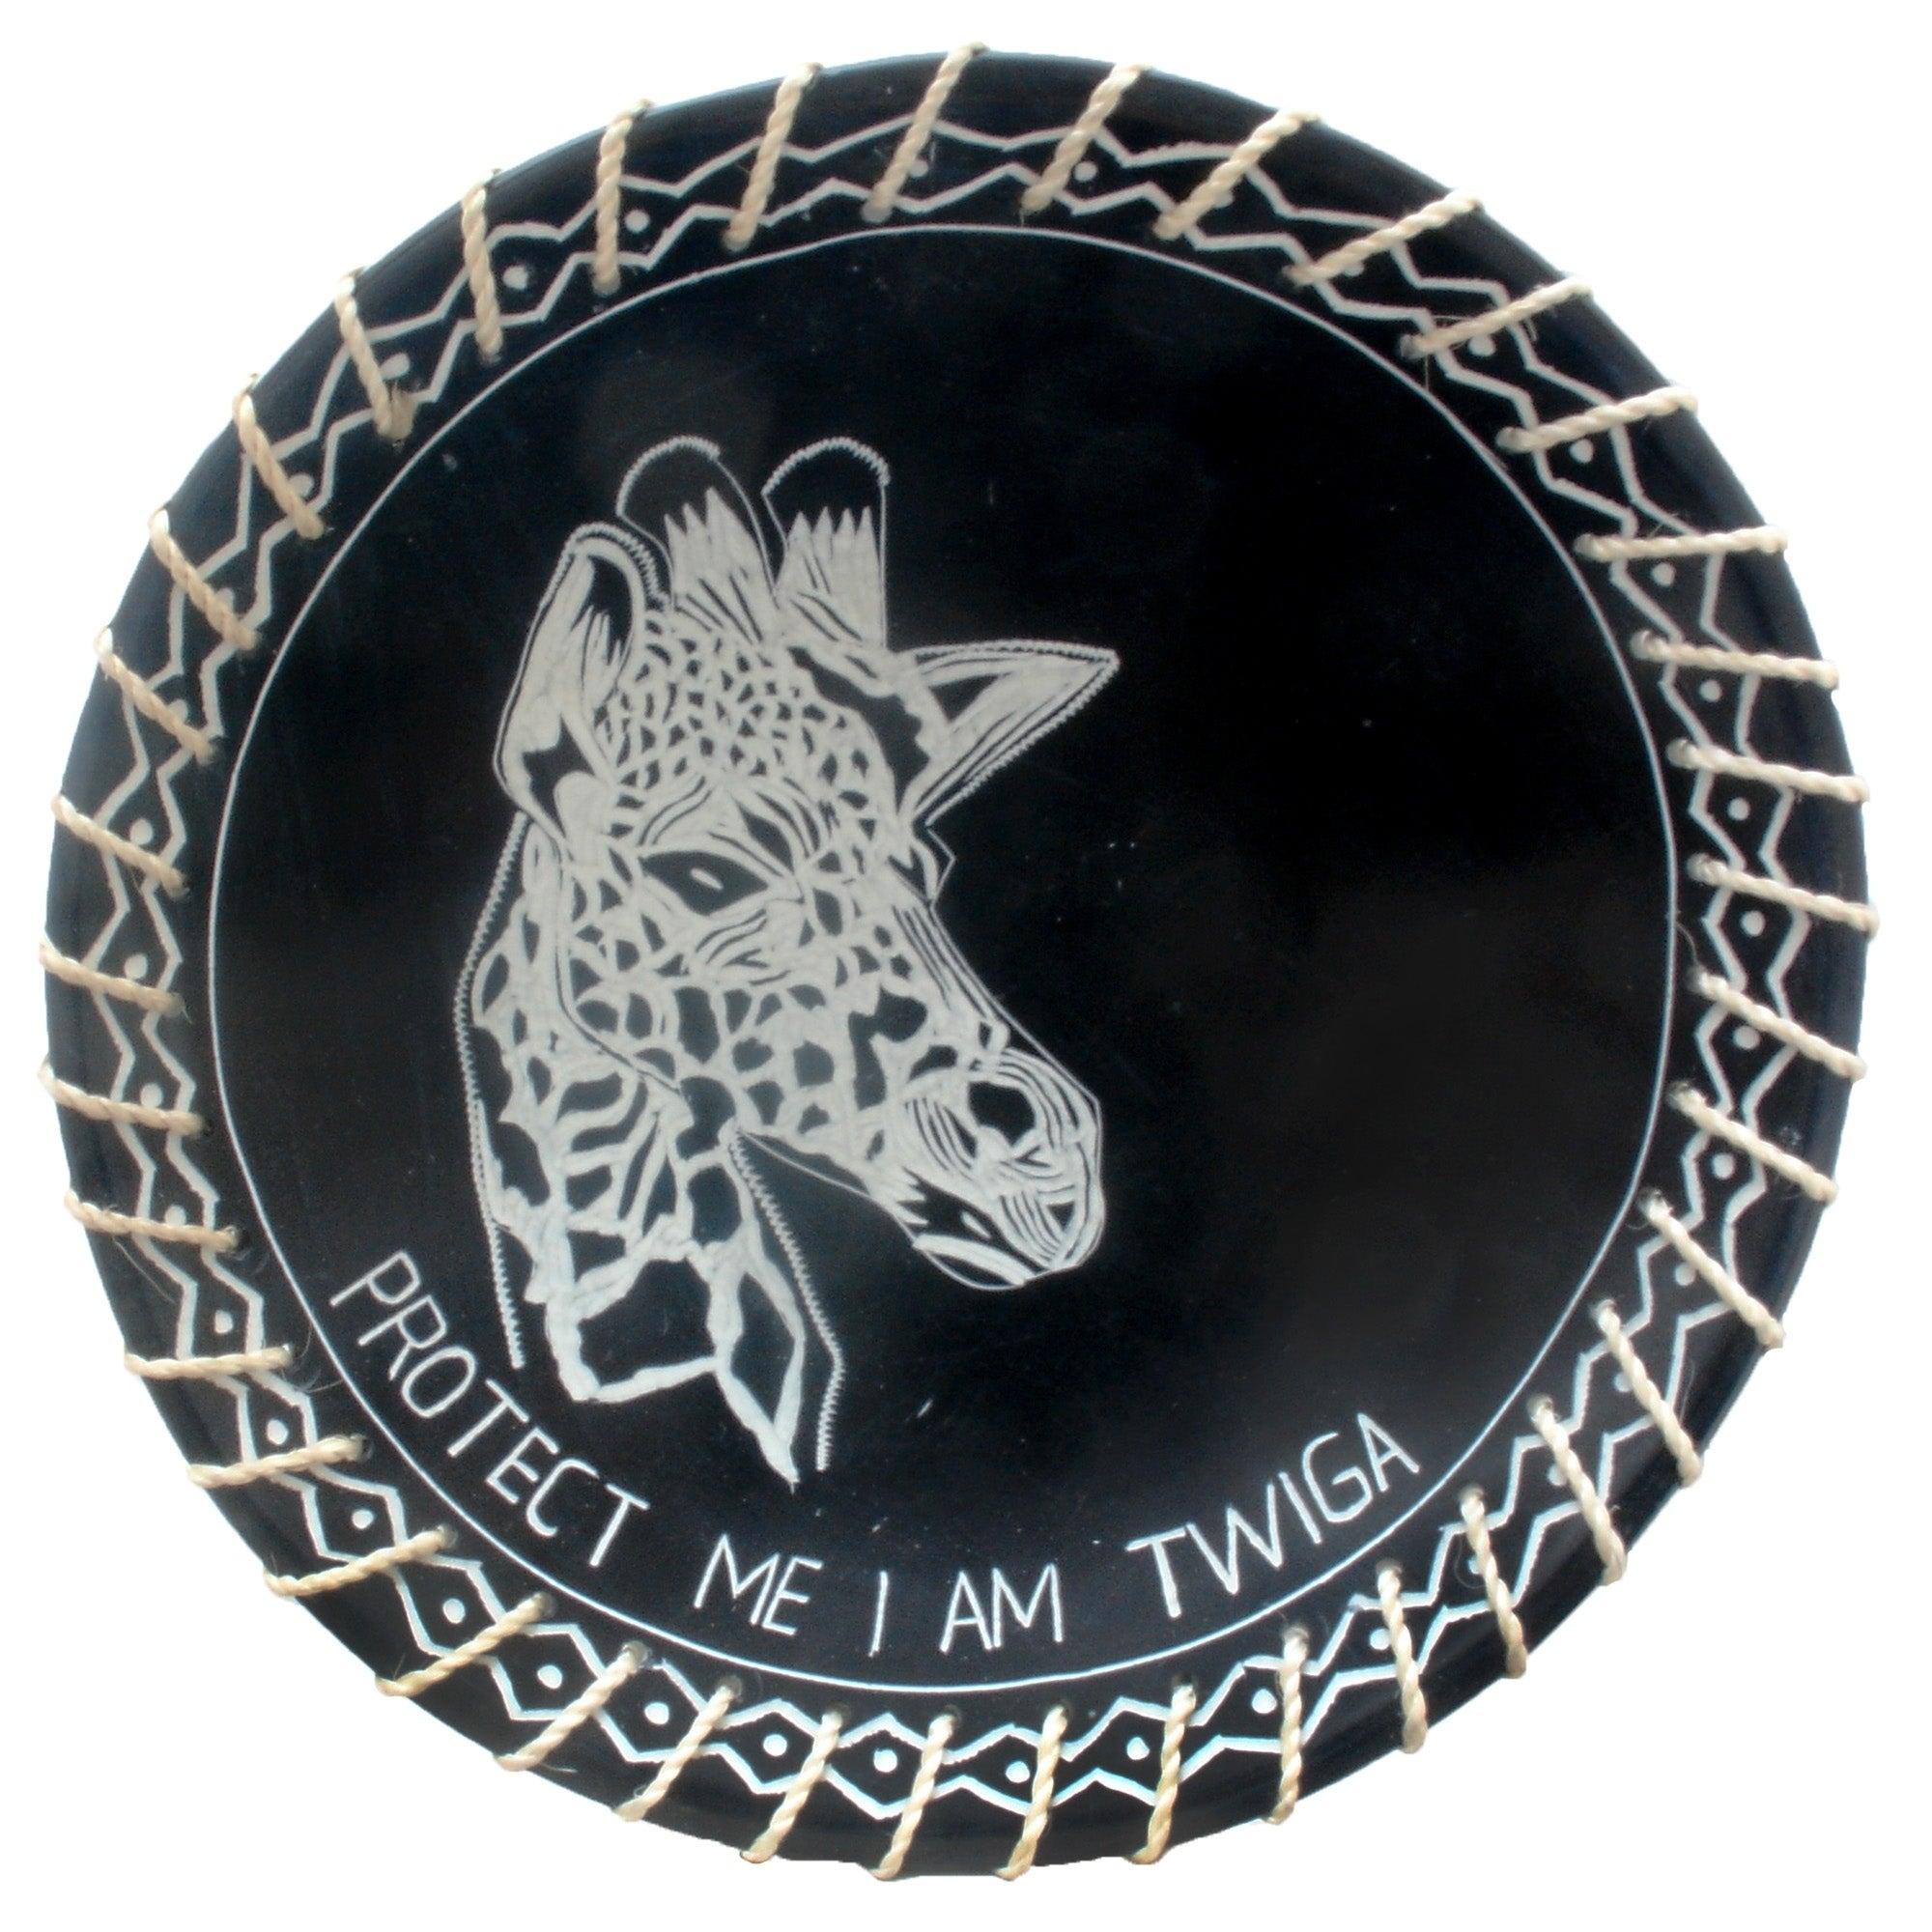 Protect Me Kisii Soapstone Decorative Giraffe Plate with Native Sisal Rope, 8